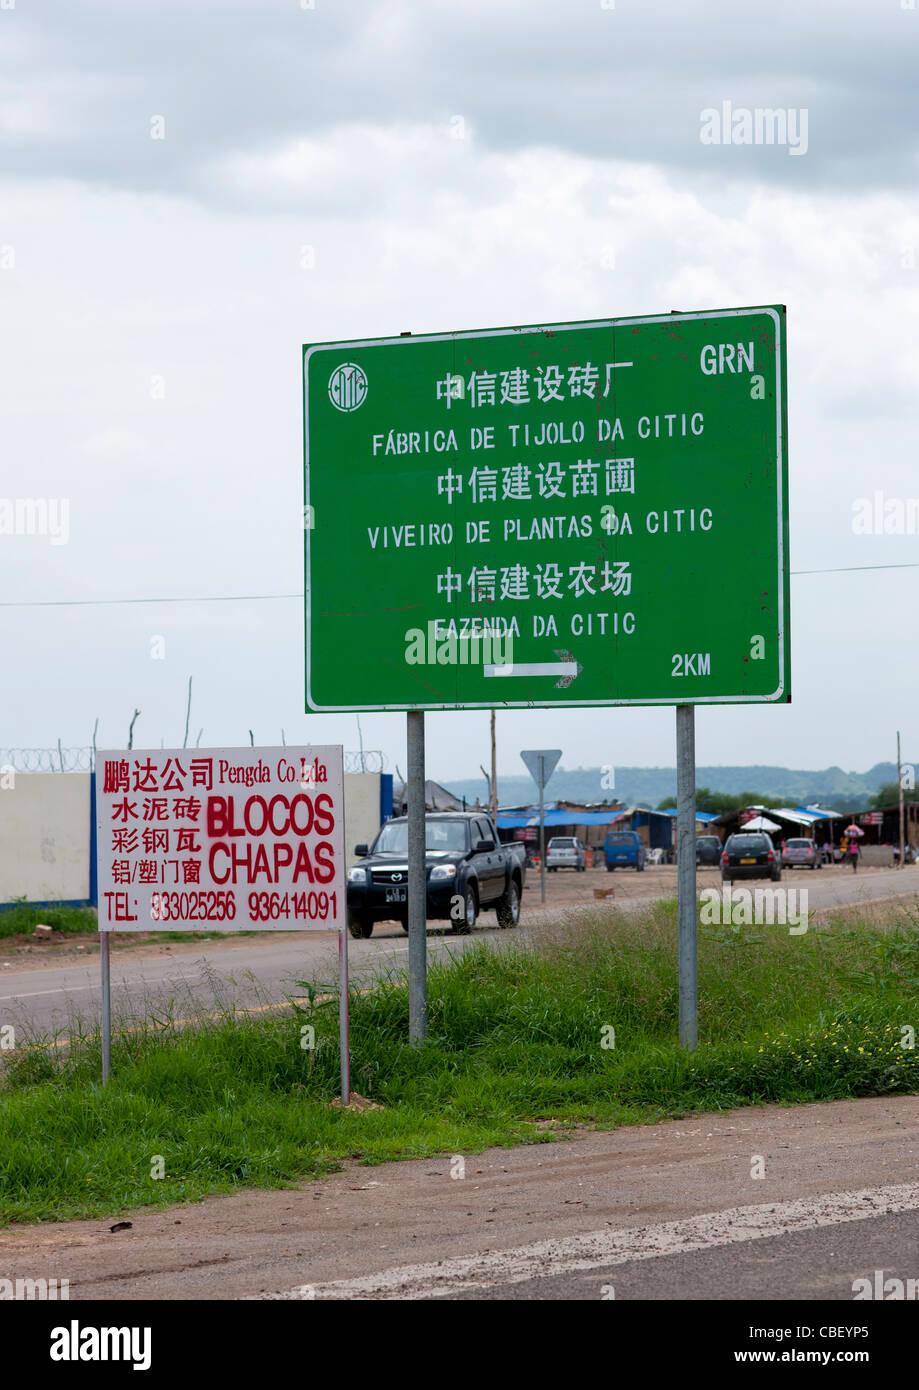 Road Sign Indicating Chinese Companies, Luanda, Angola - Stock Image